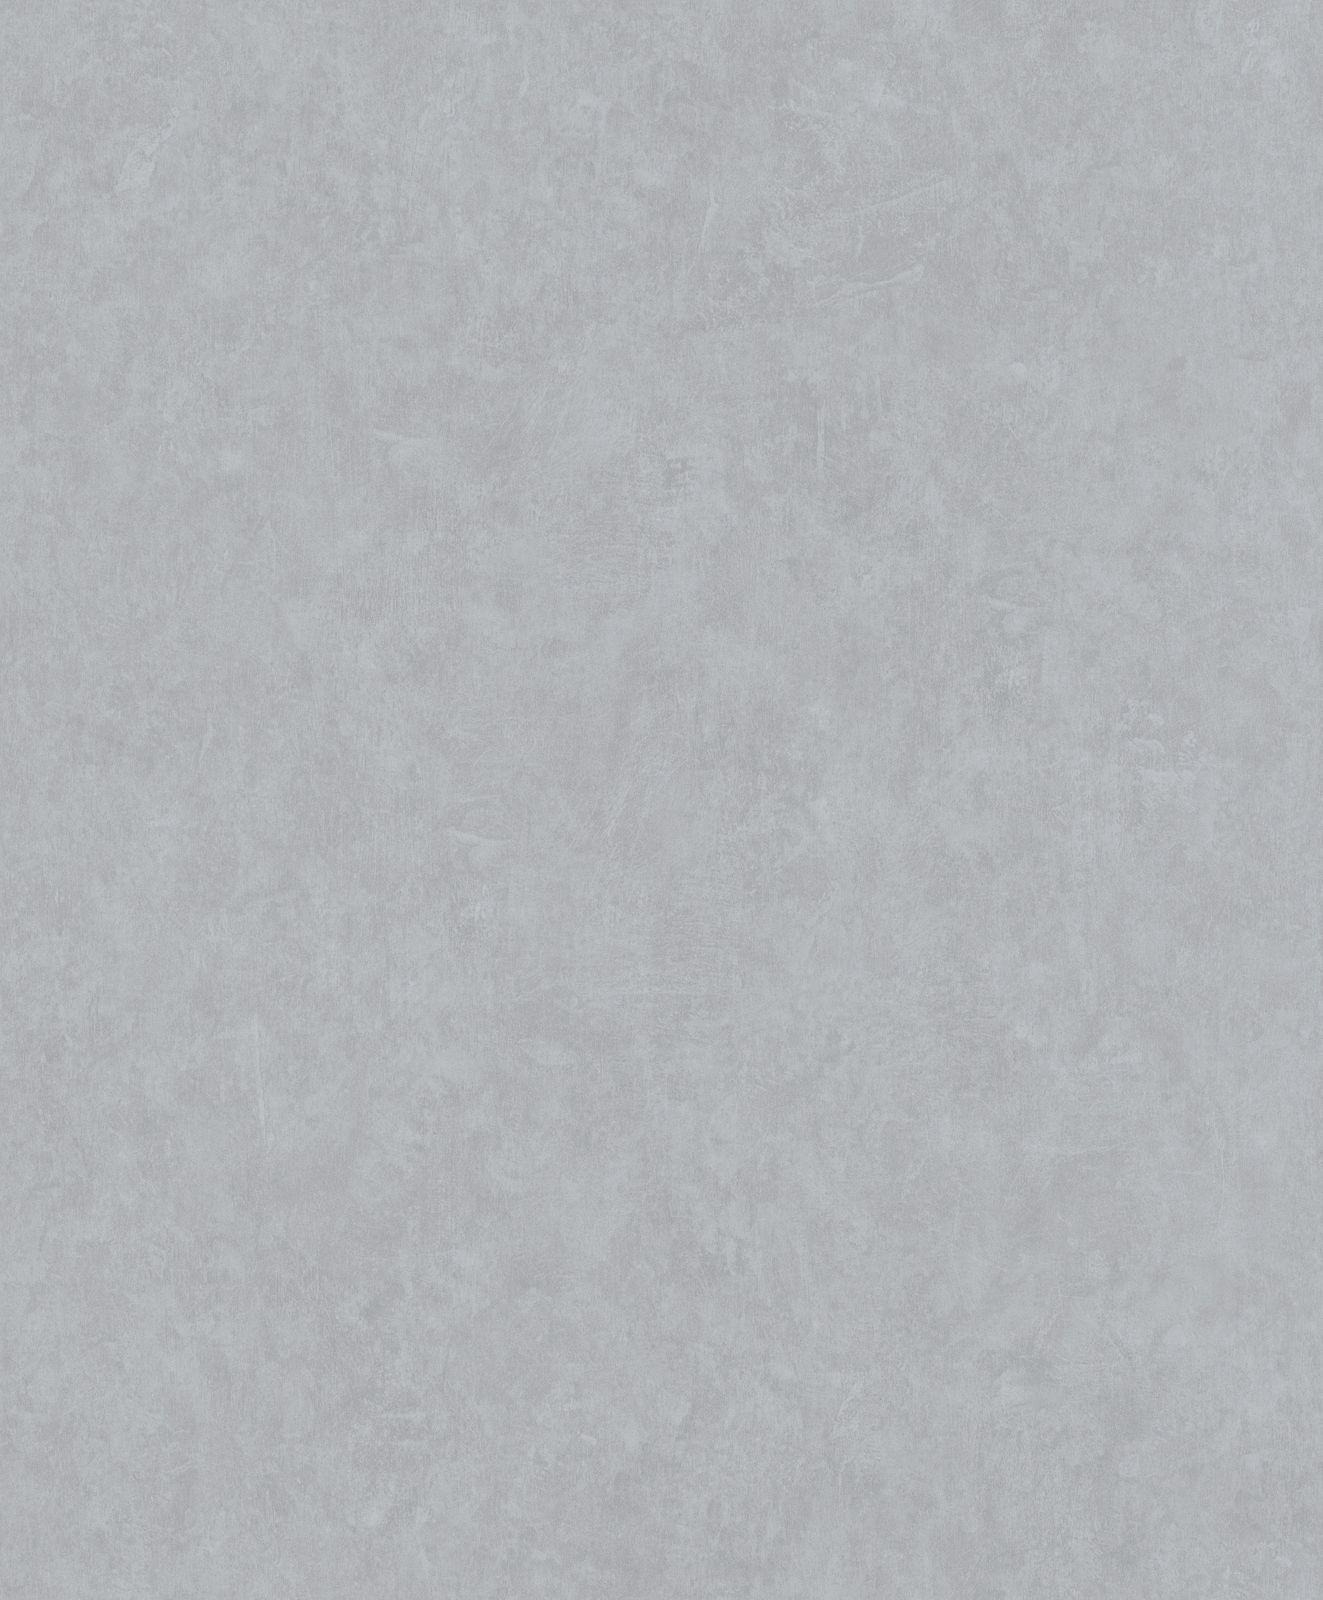 tapete vlies betonoptik blaugrau rasch deco relief 512656. Black Bedroom Furniture Sets. Home Design Ideas